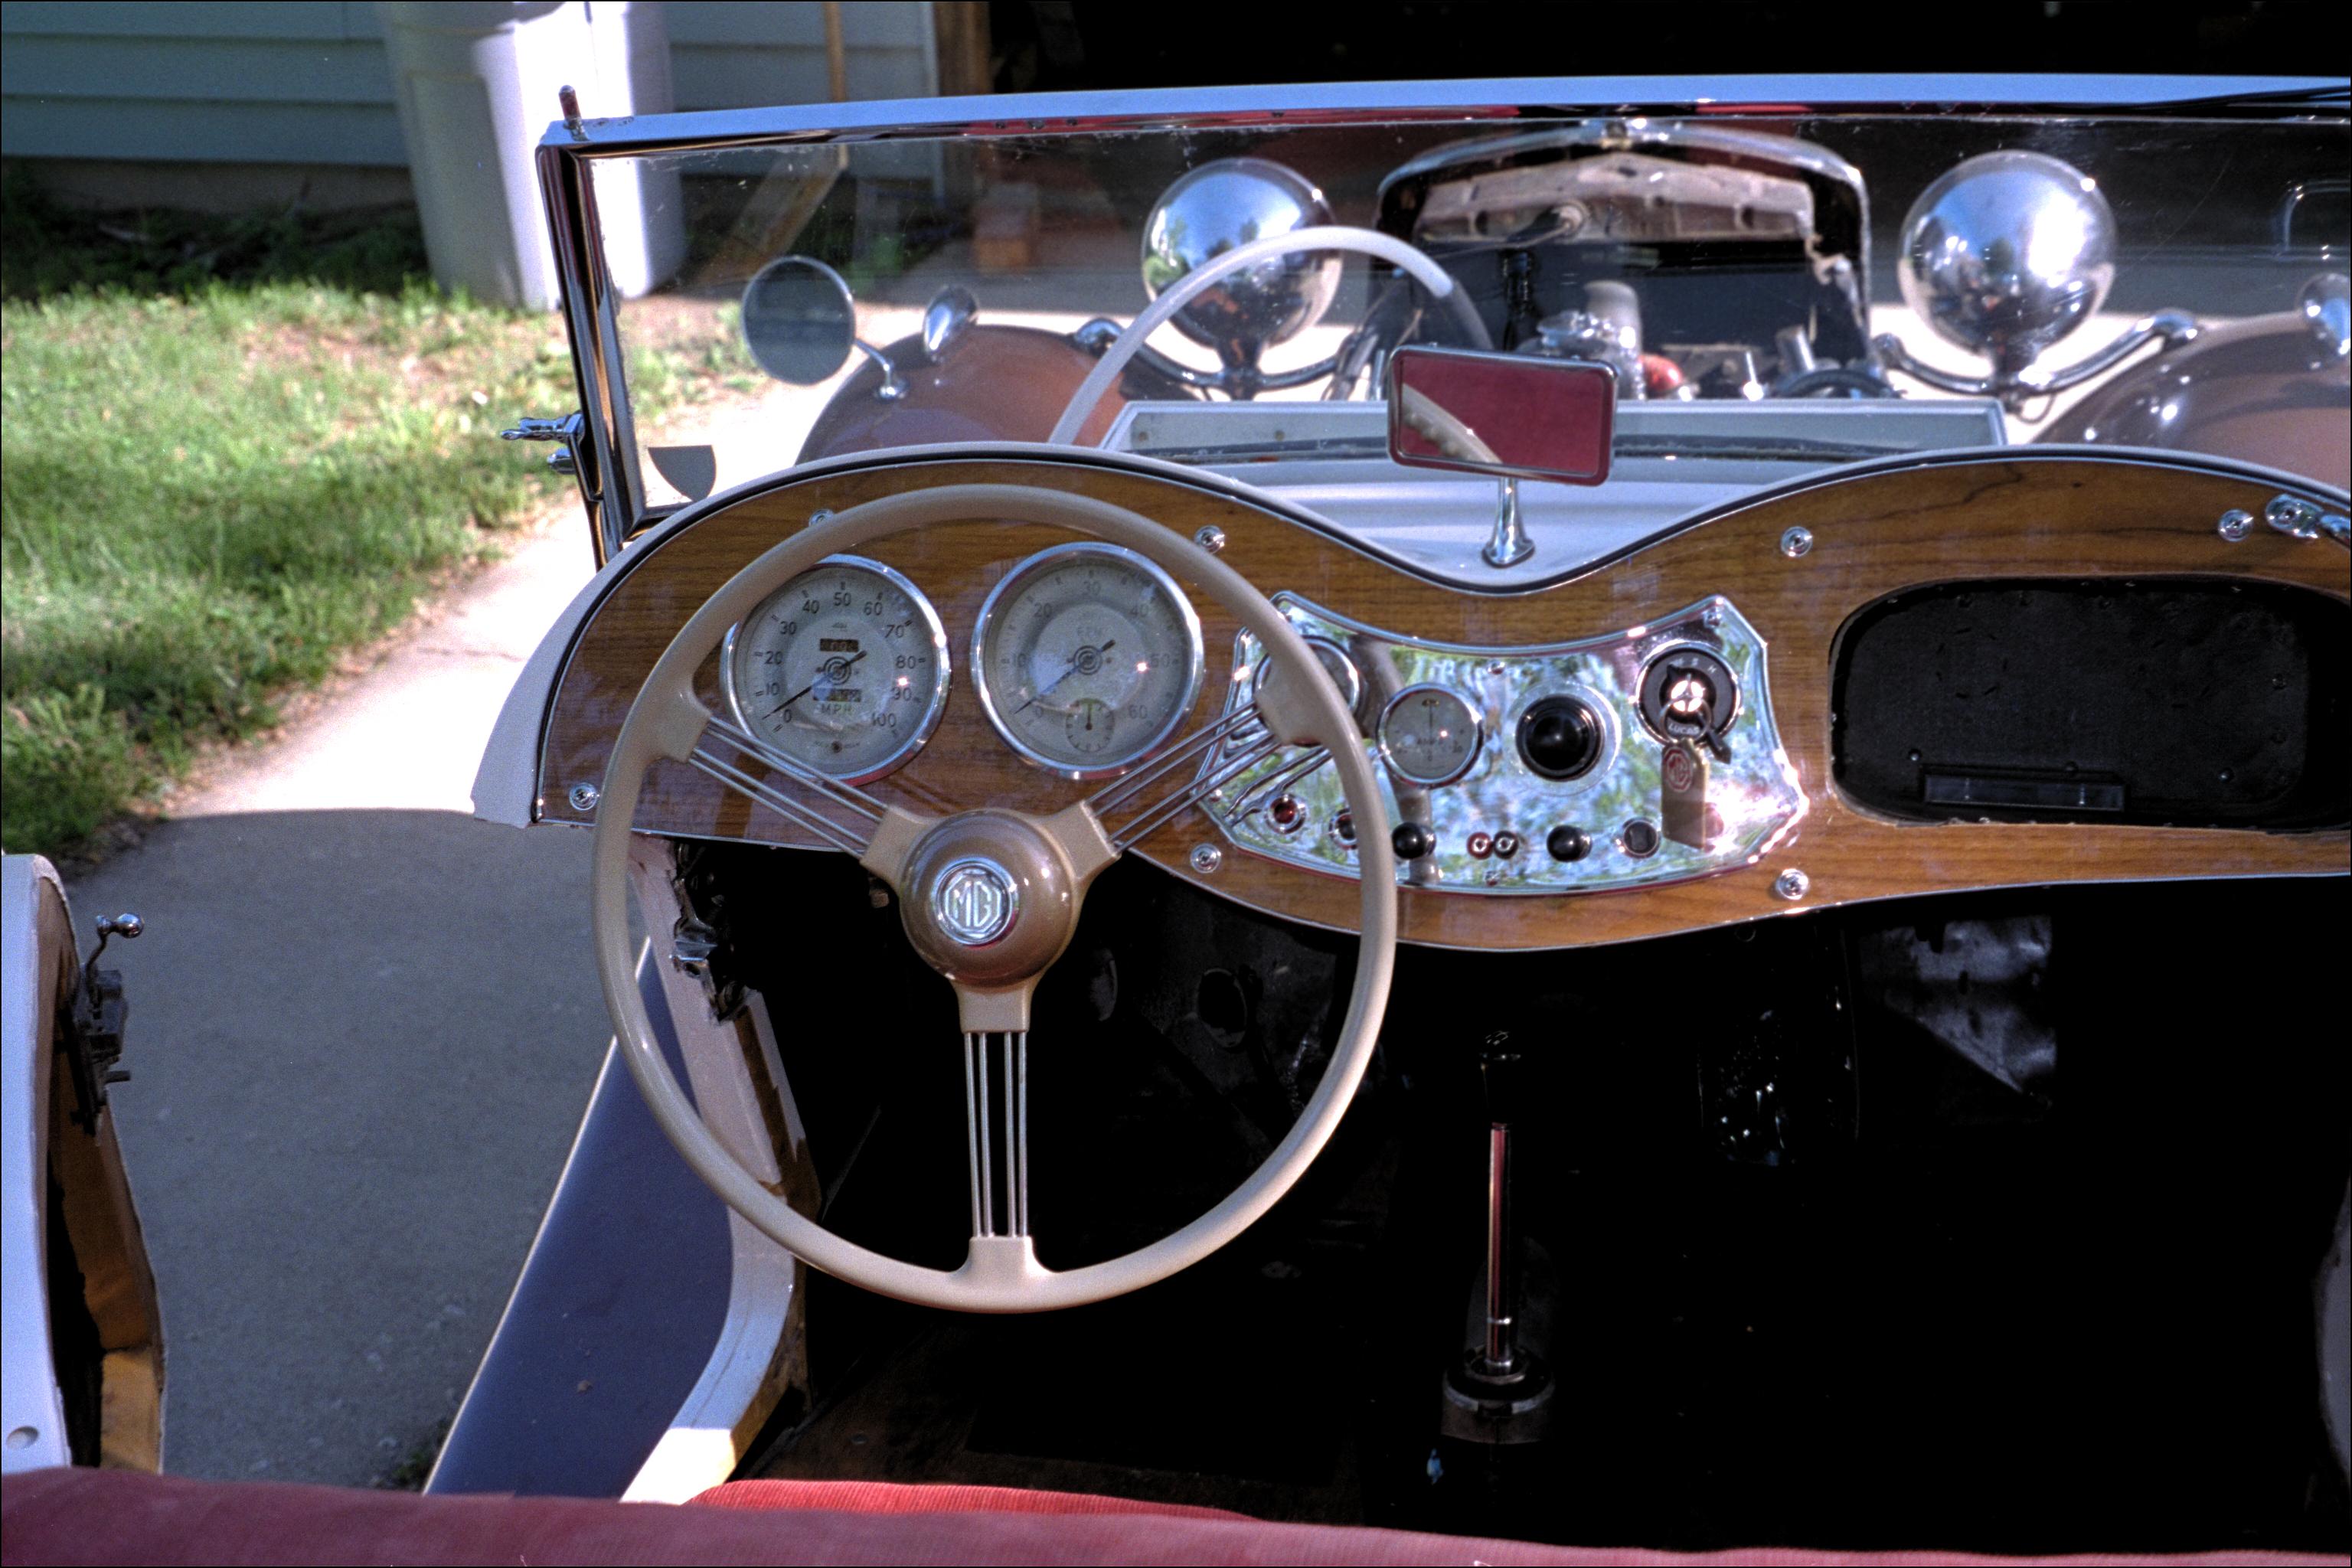 The new steering wheel